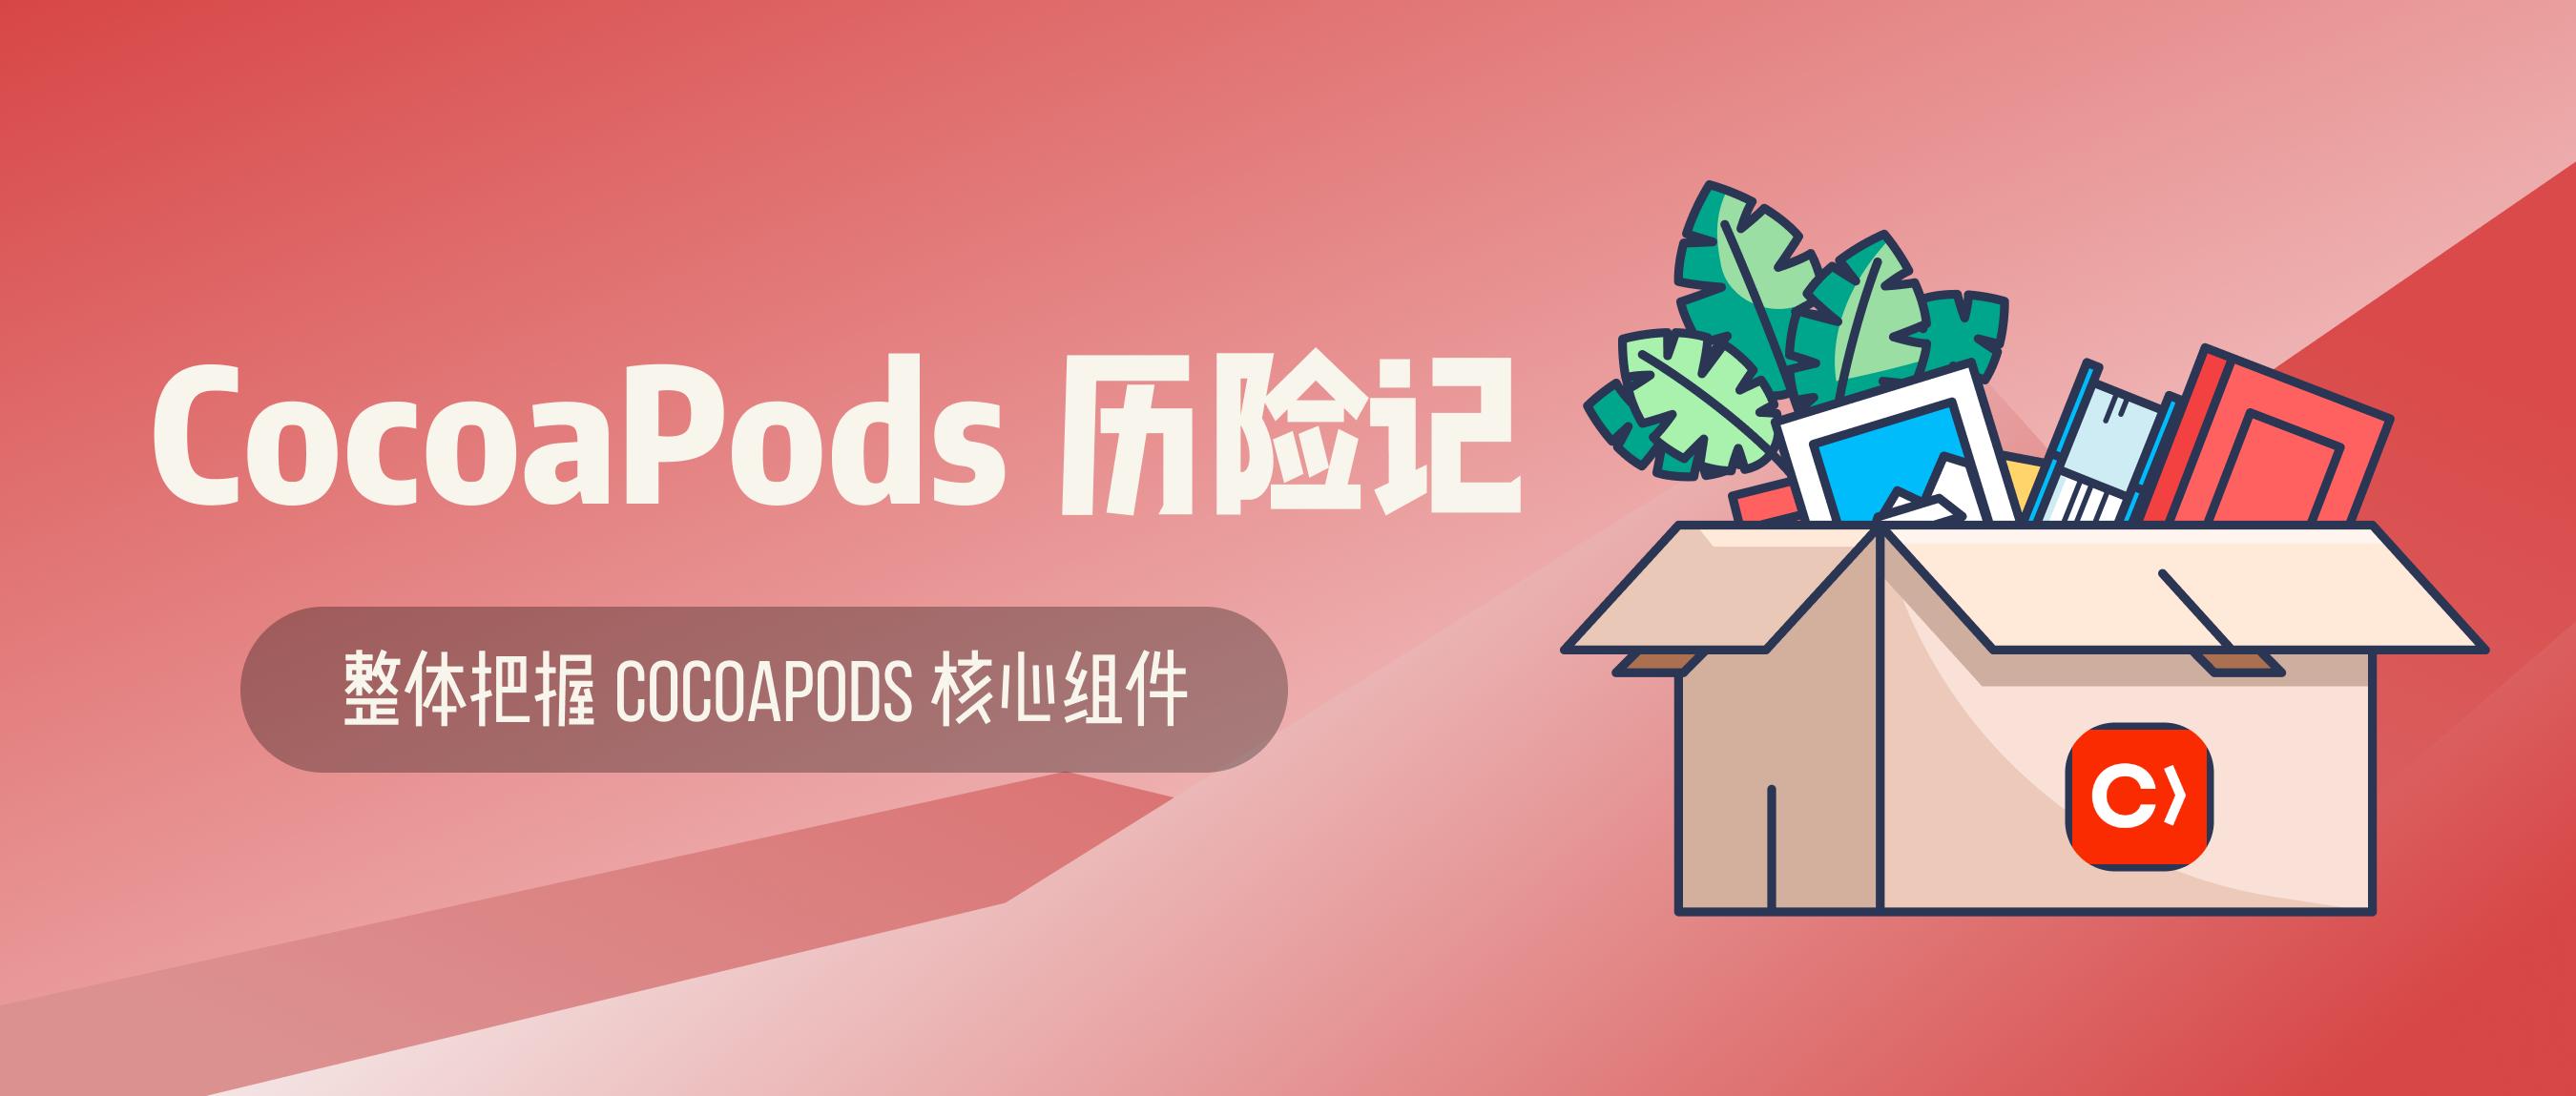 2. 整体把握 CocoaPods 核心组件